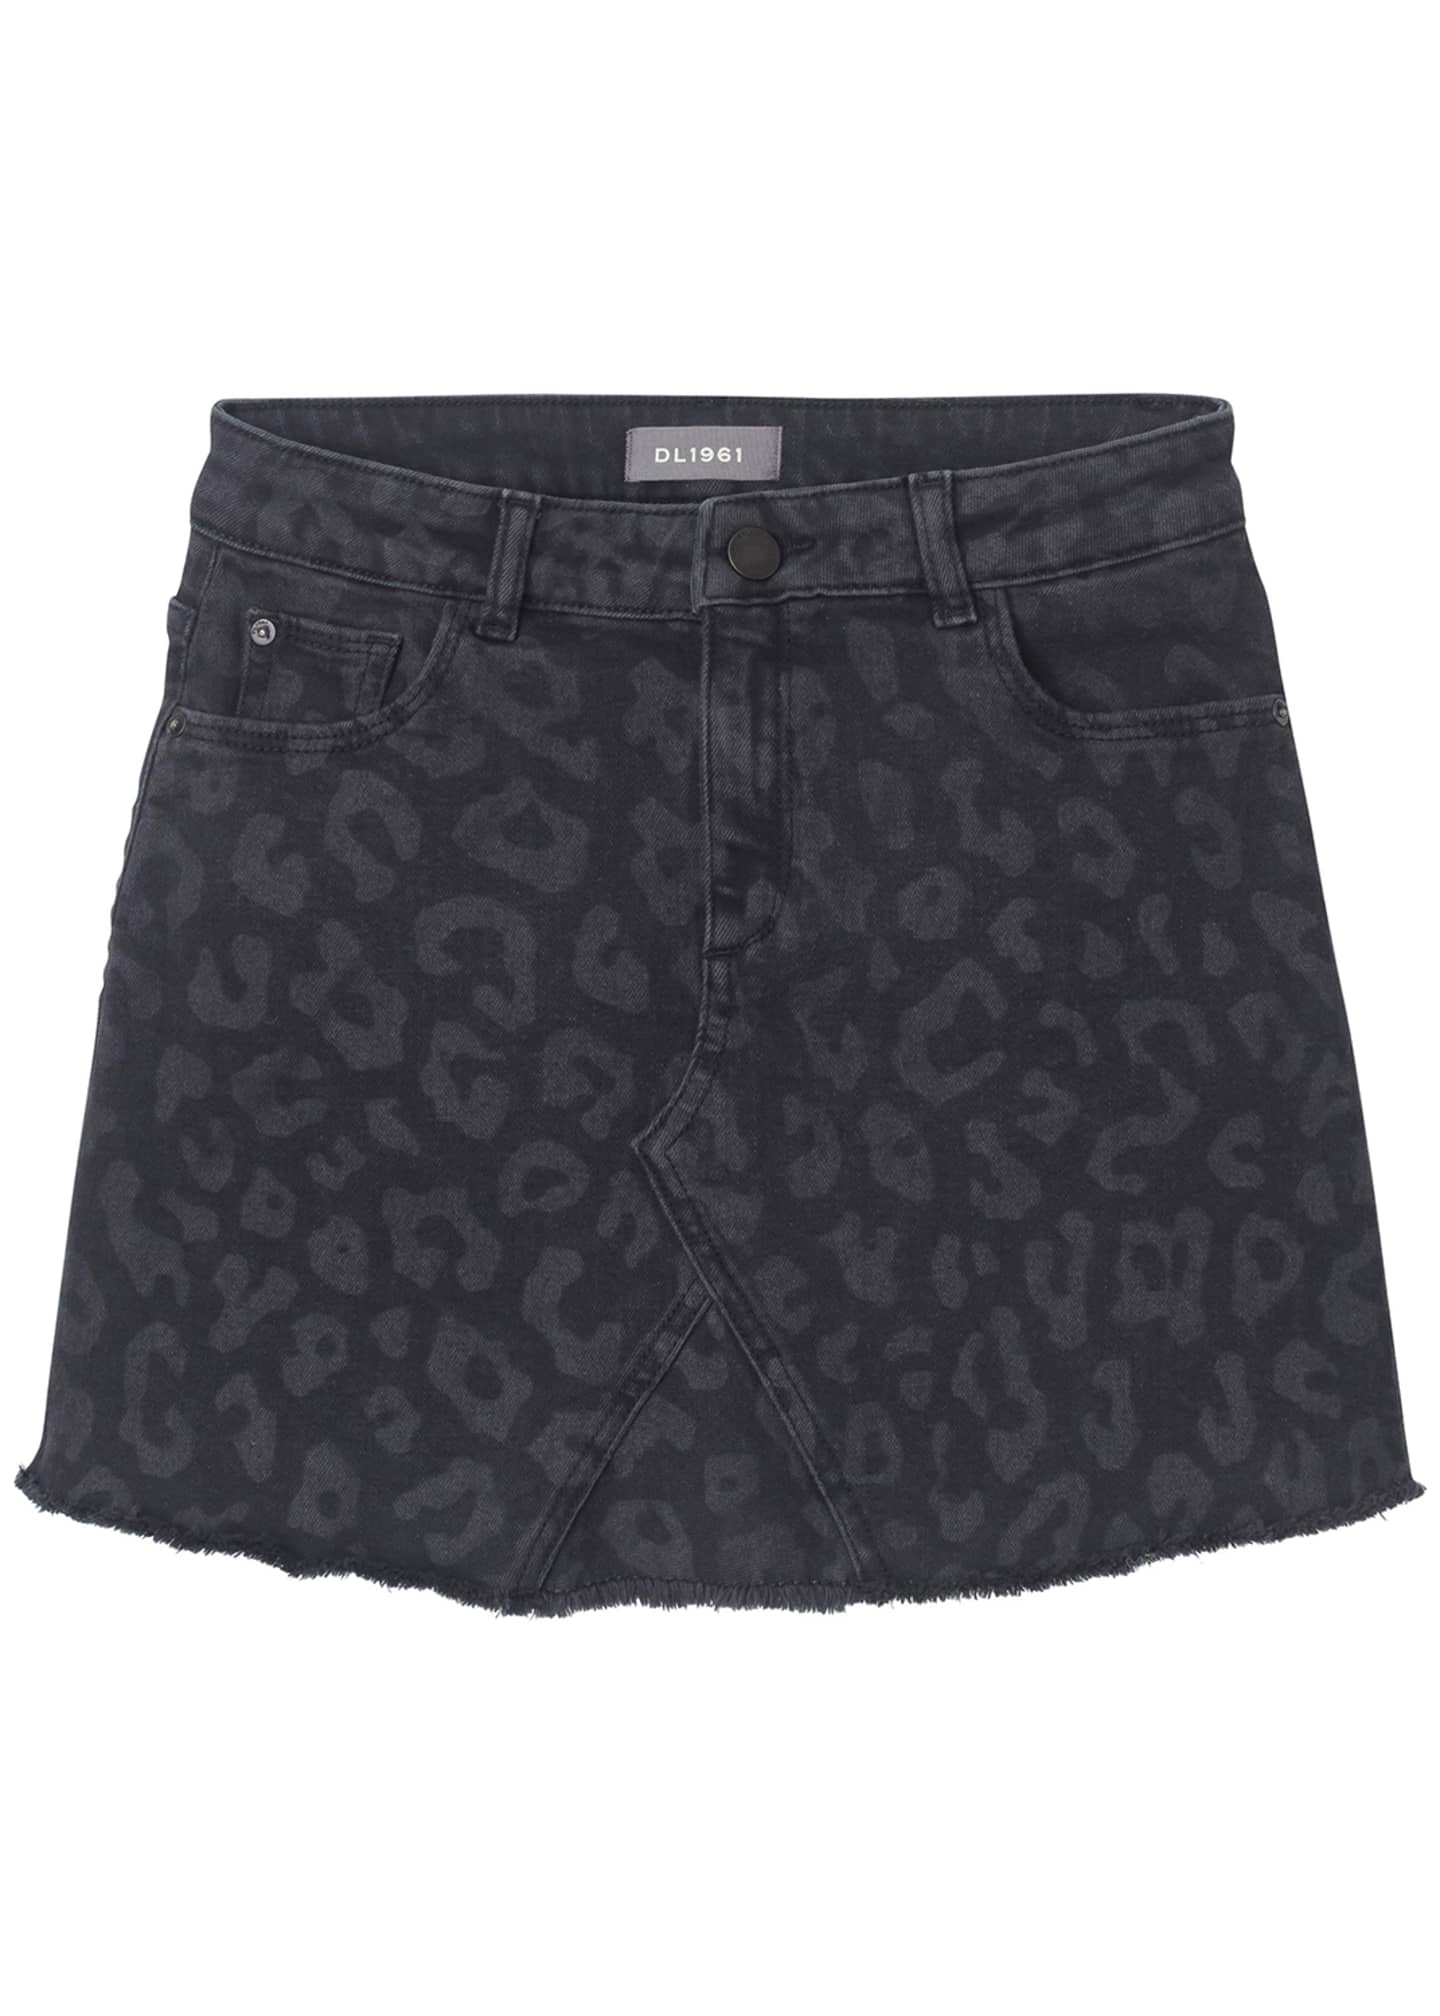 DL 1961 Jenny Tonal Leopard-Print Skirt, Size 7-16